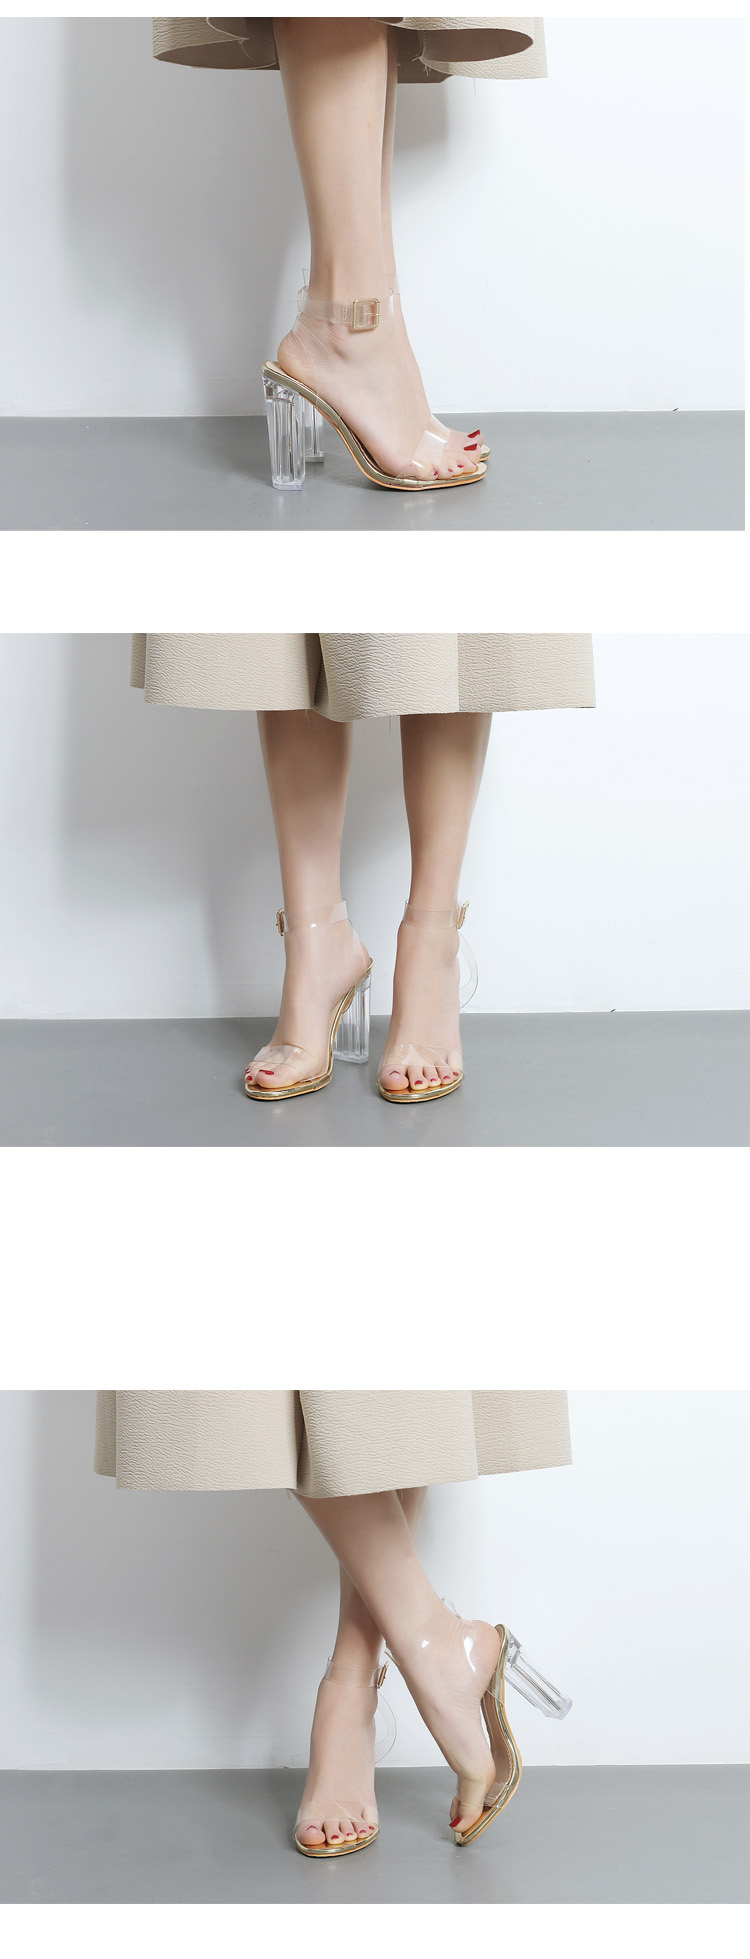 HTB1zBddXdfvK1RjSspfq6zzXFXaO Eilyken 2019 PVC Jelly Sandals Crystal Leopard Open Toed High Heels Women Transparent Heel Sandals Slippers Discount Pumps 11CM